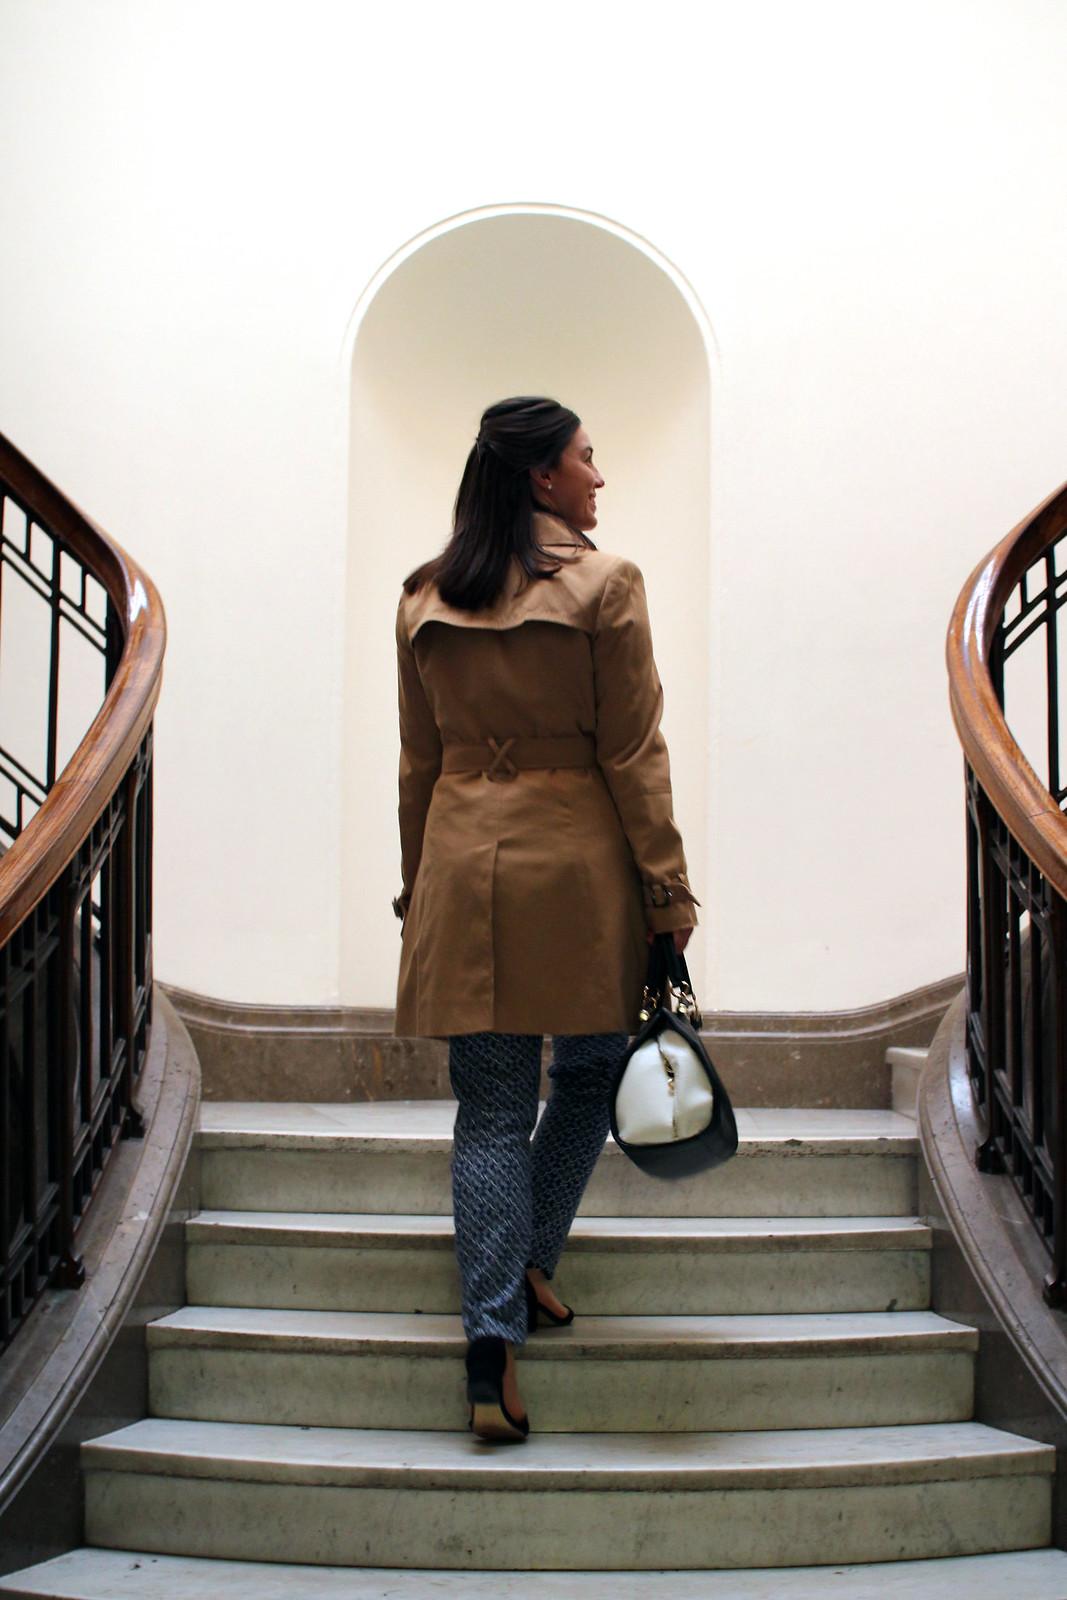 National portrait gallery Edinburgh Scotland travel lifestyle blogger